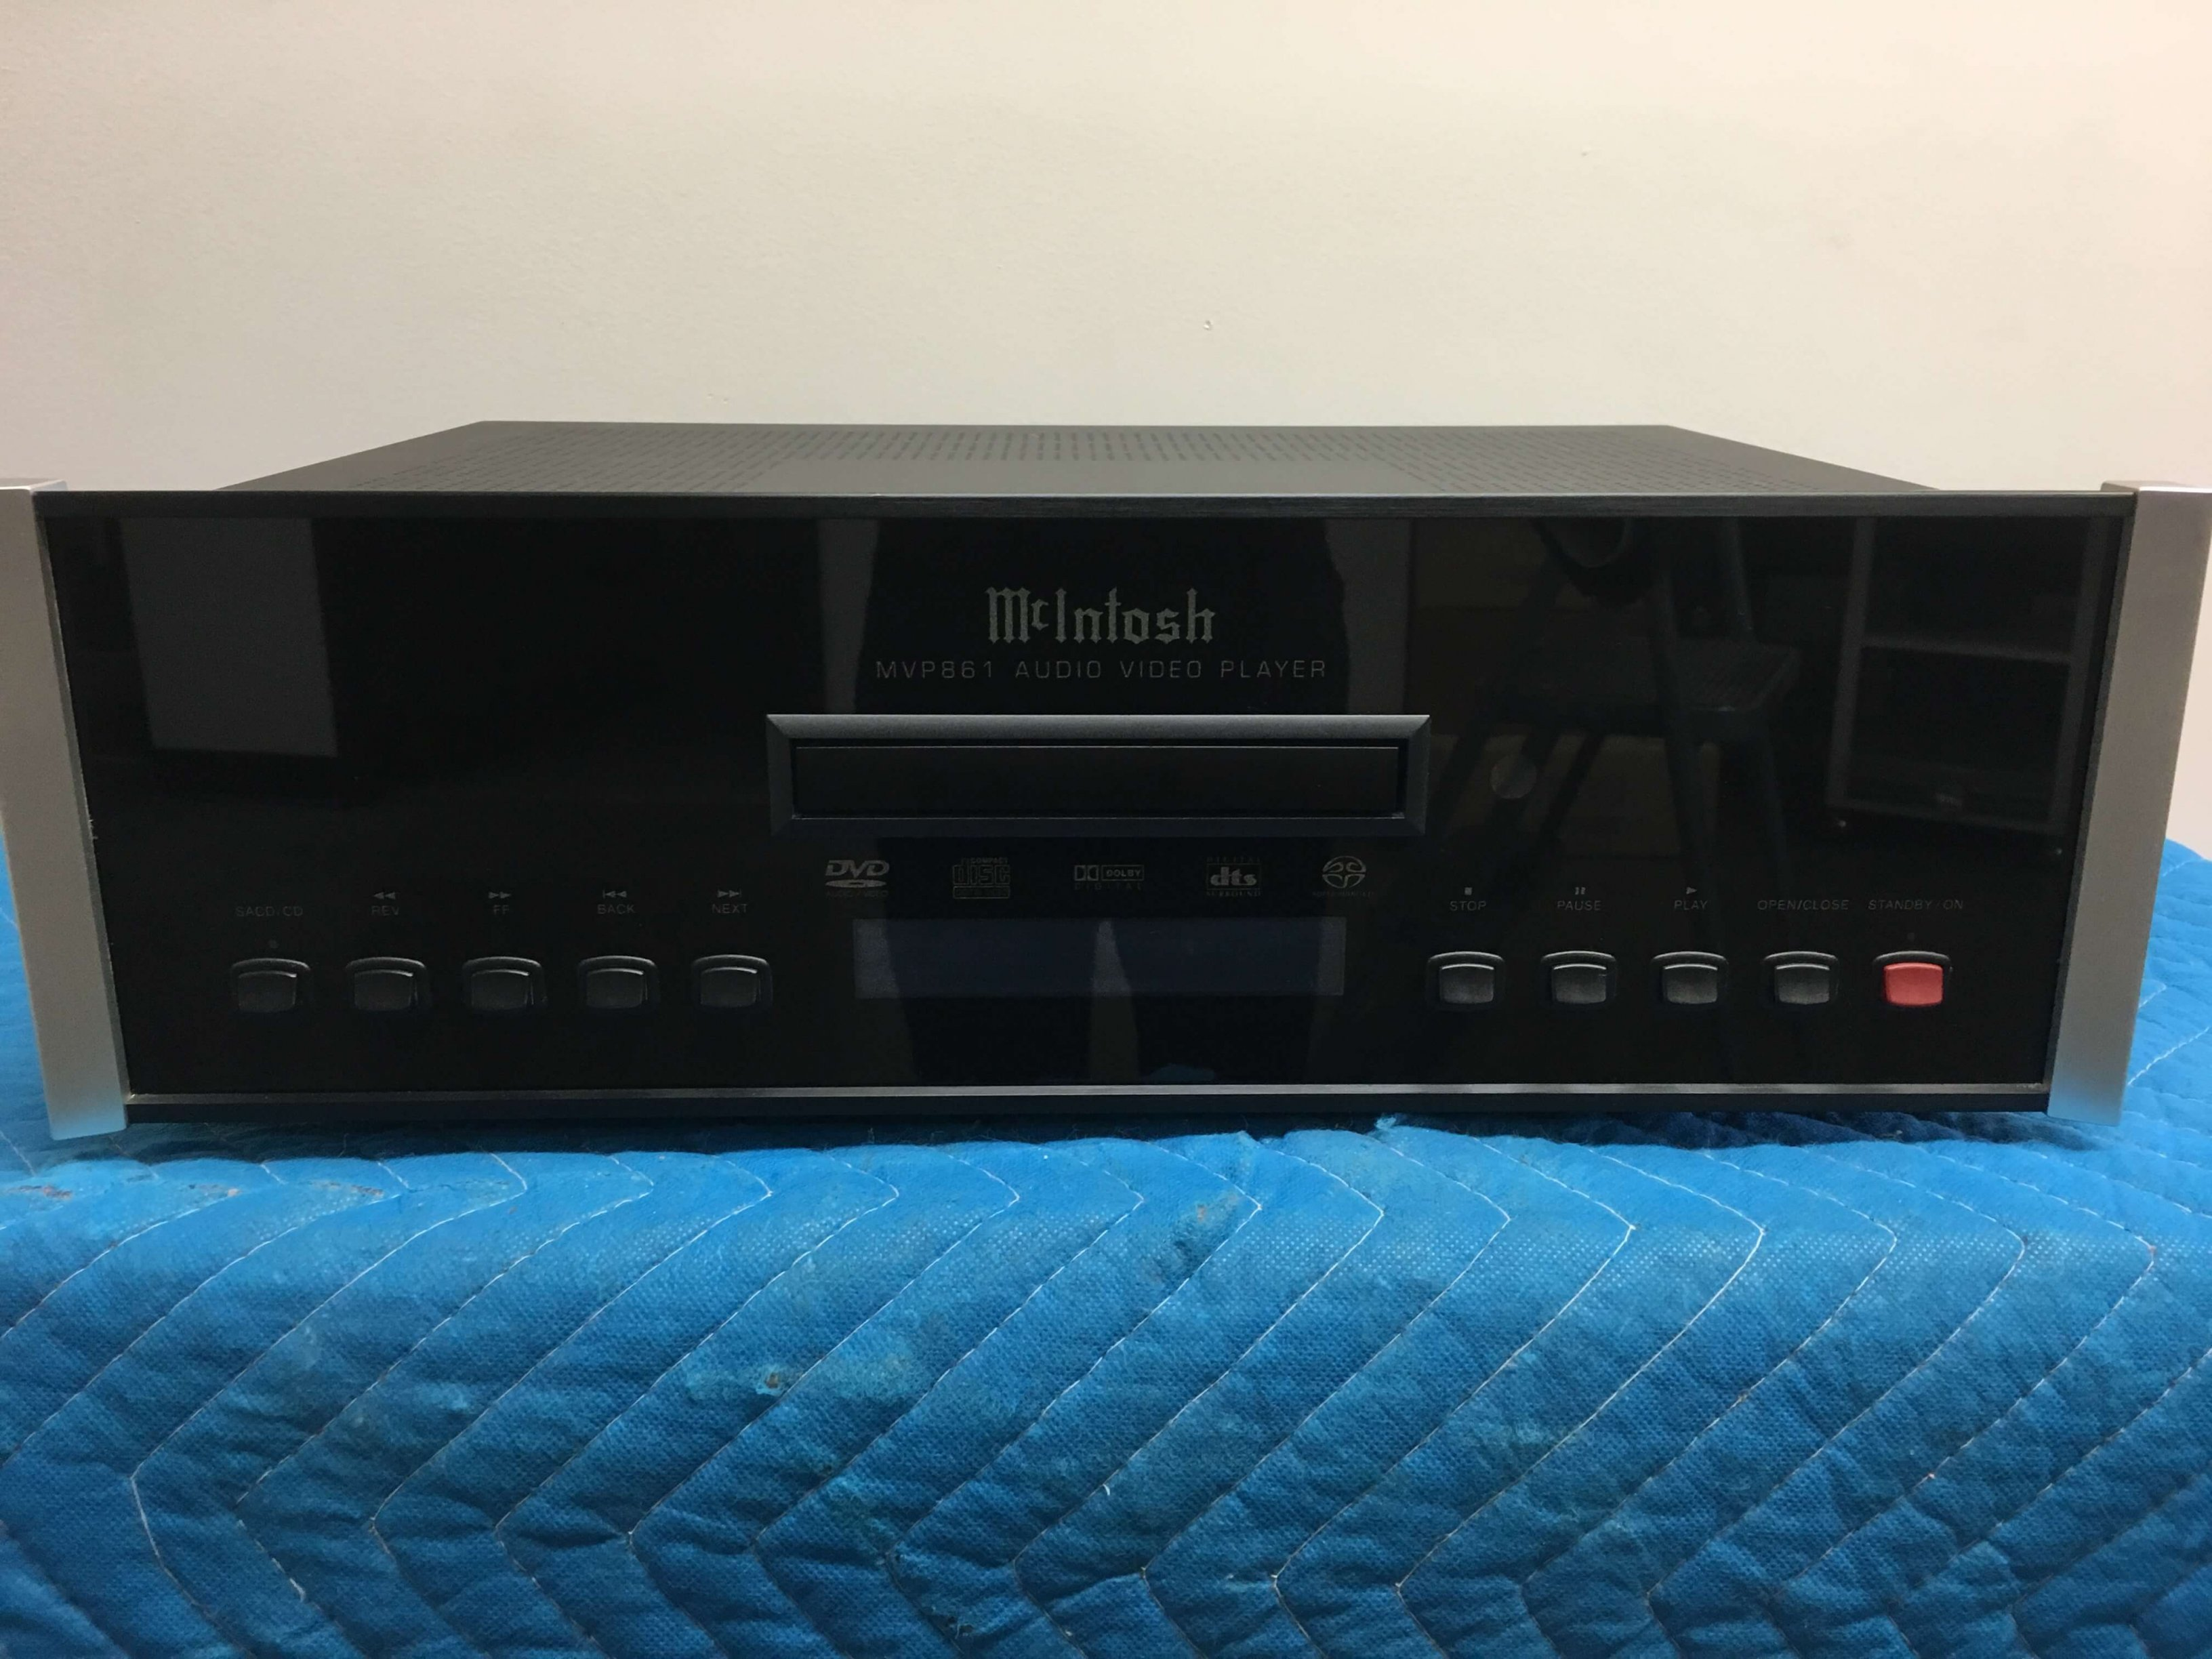 McIntosh MVP861 DVD/CD player